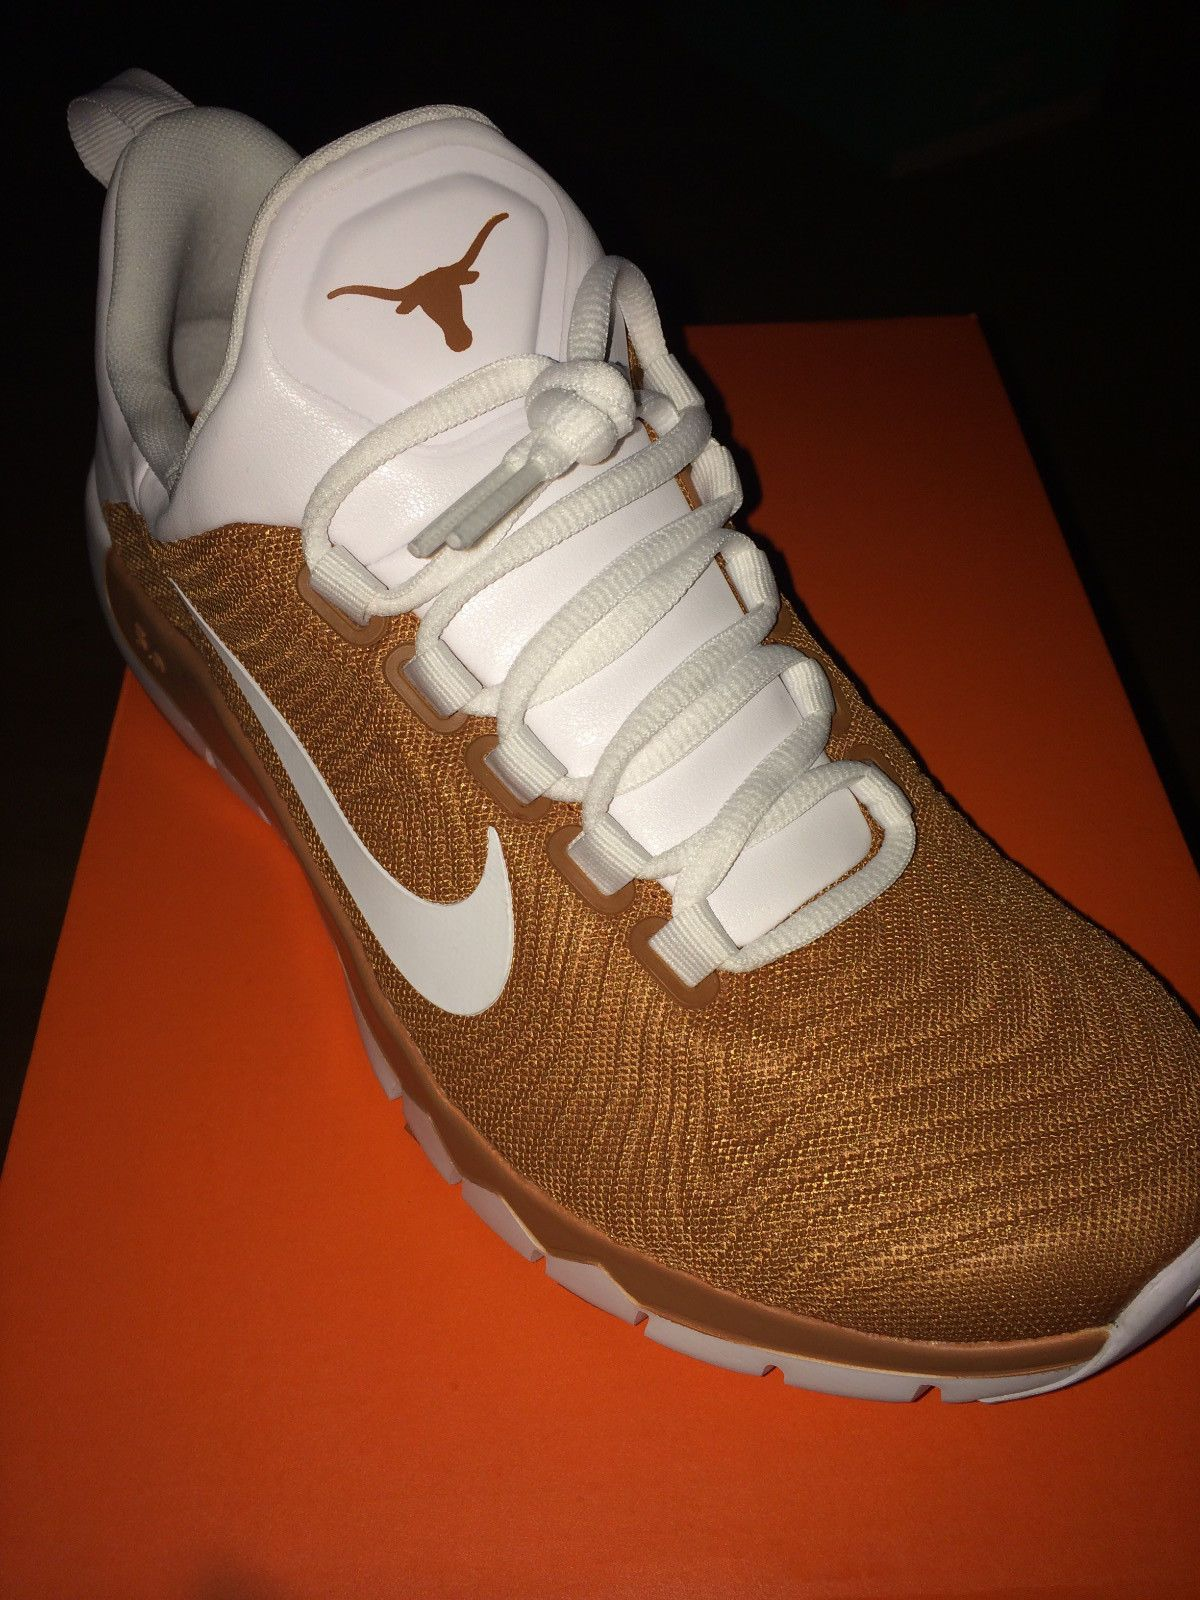 Nike Free Trainer 5.0 Longhorn Edition